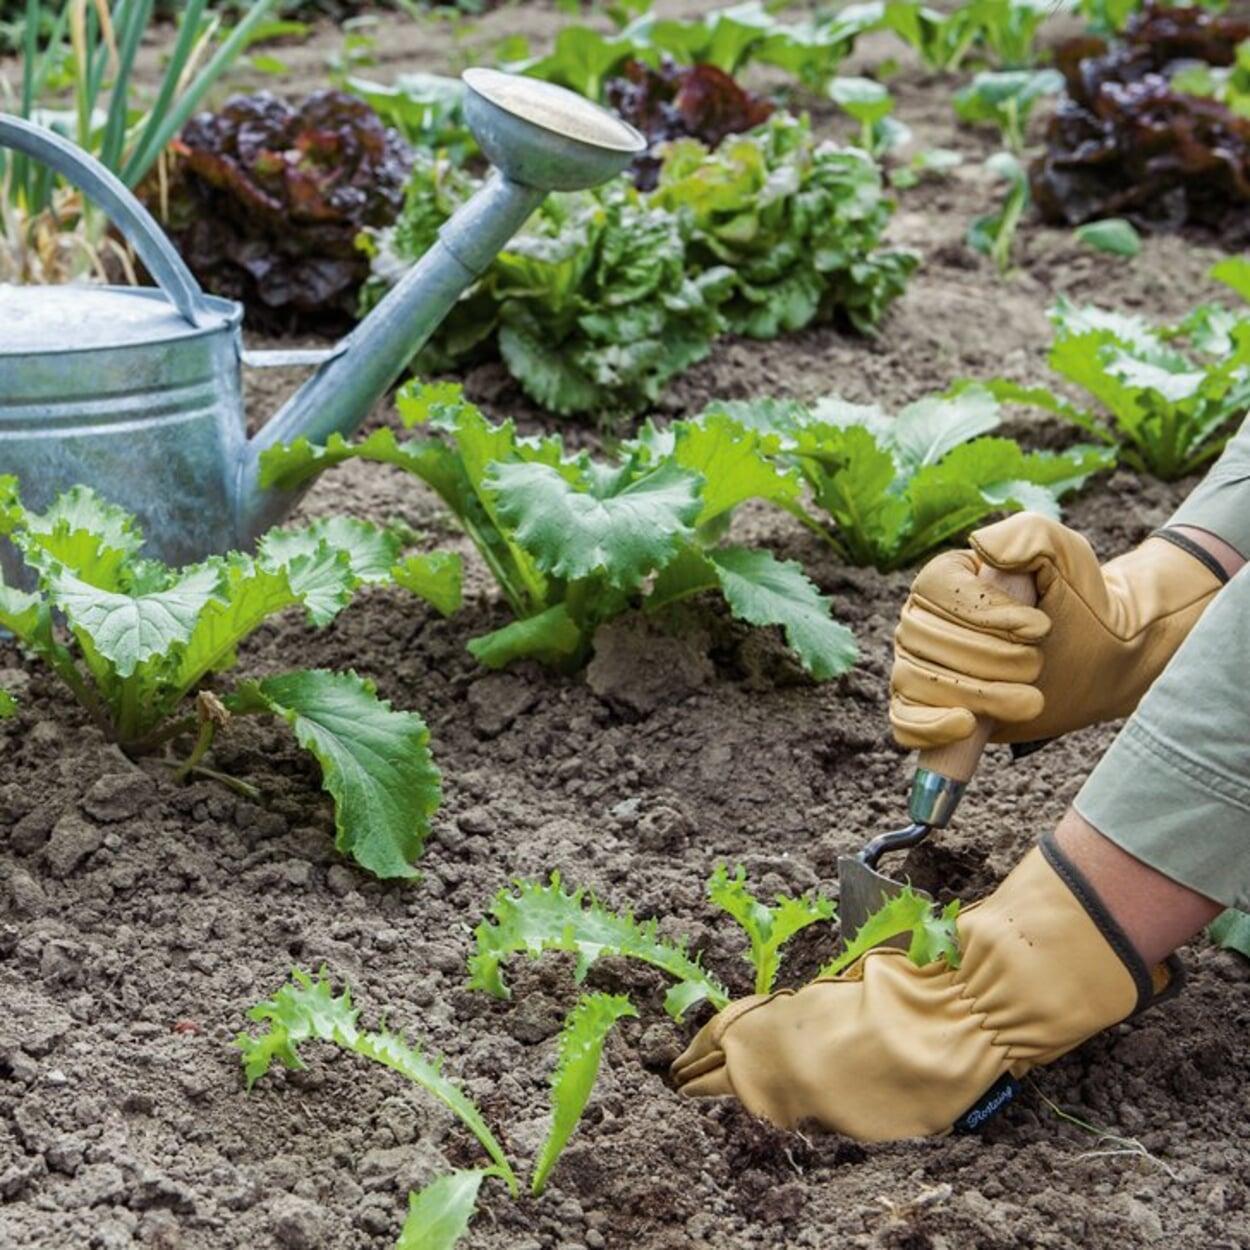 Gemüse auspflanzen